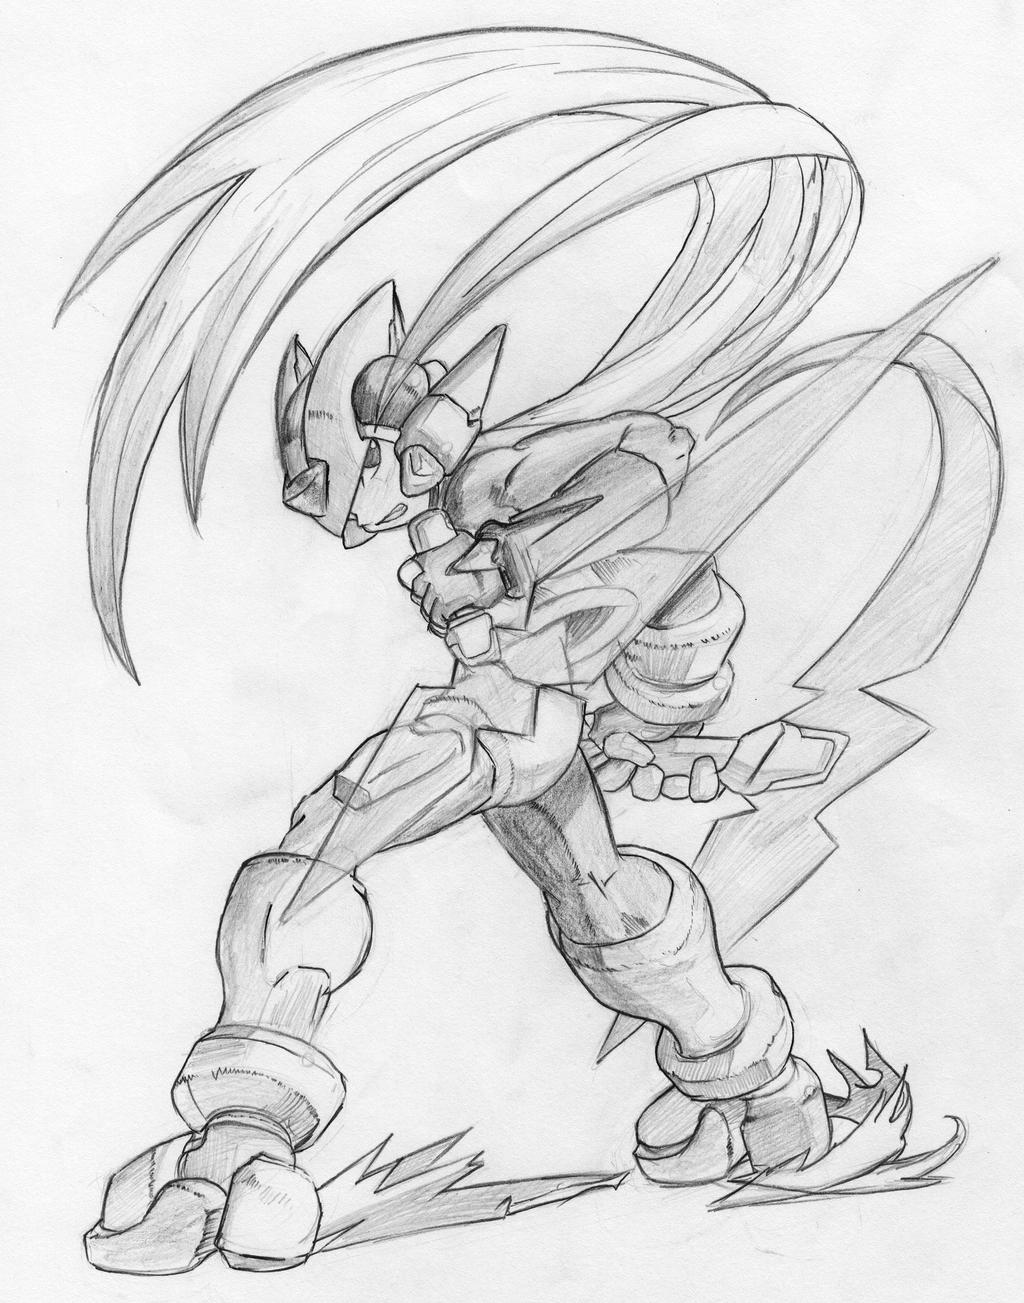 mega man zero by megamanex mario coloring pages - Mega Man Printable Coloring Pages